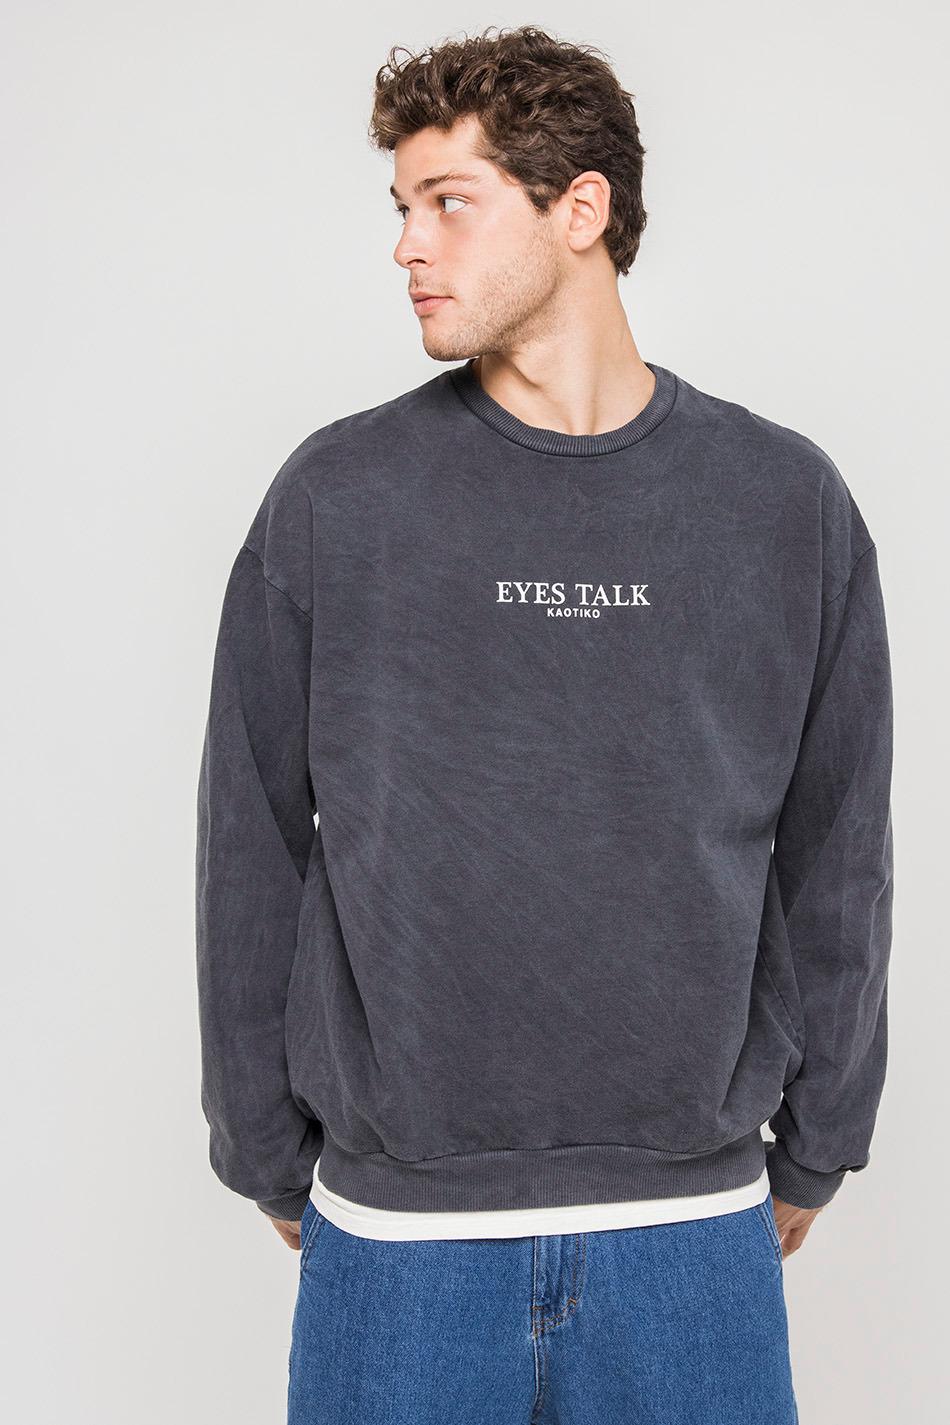 Eyes Talk Washed Sweatshirt